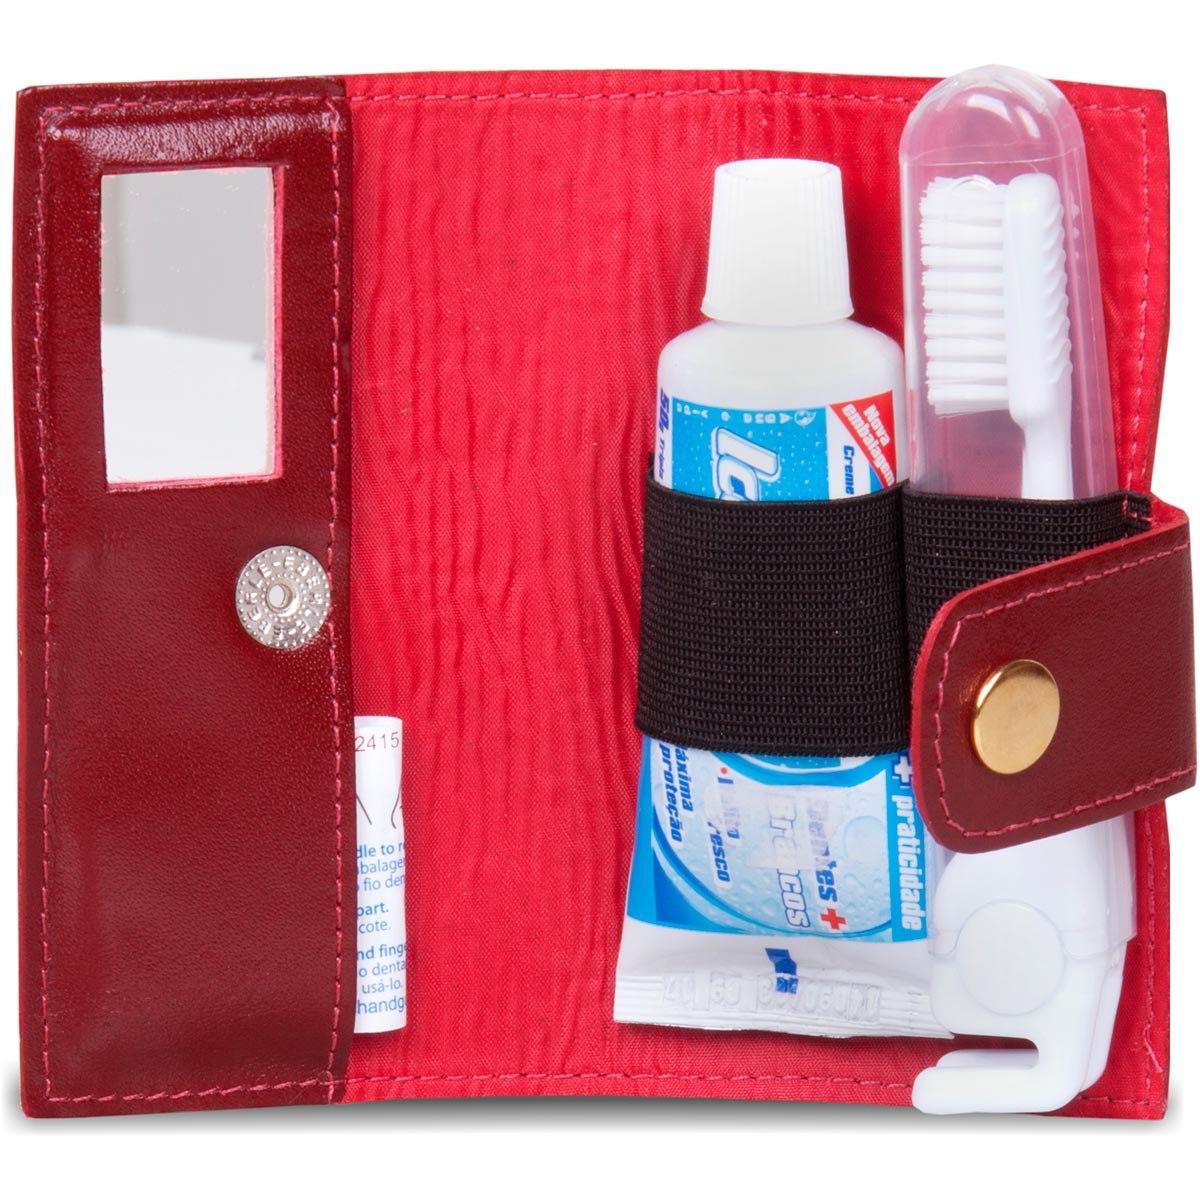 Kit Higiene Bucal Artlux em Couro